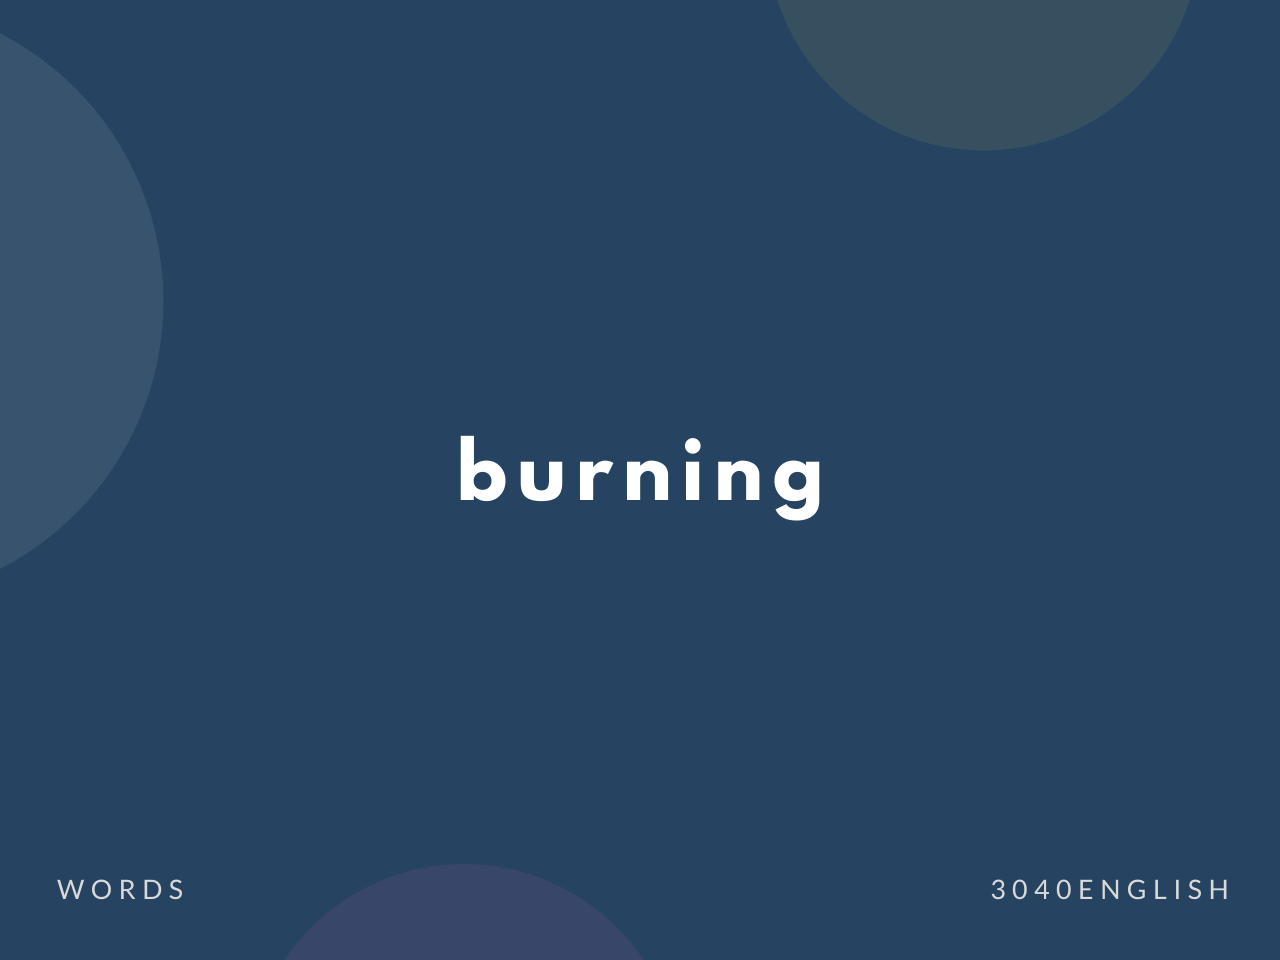 burning の意味と簡単な使い方【音読用例文あり】